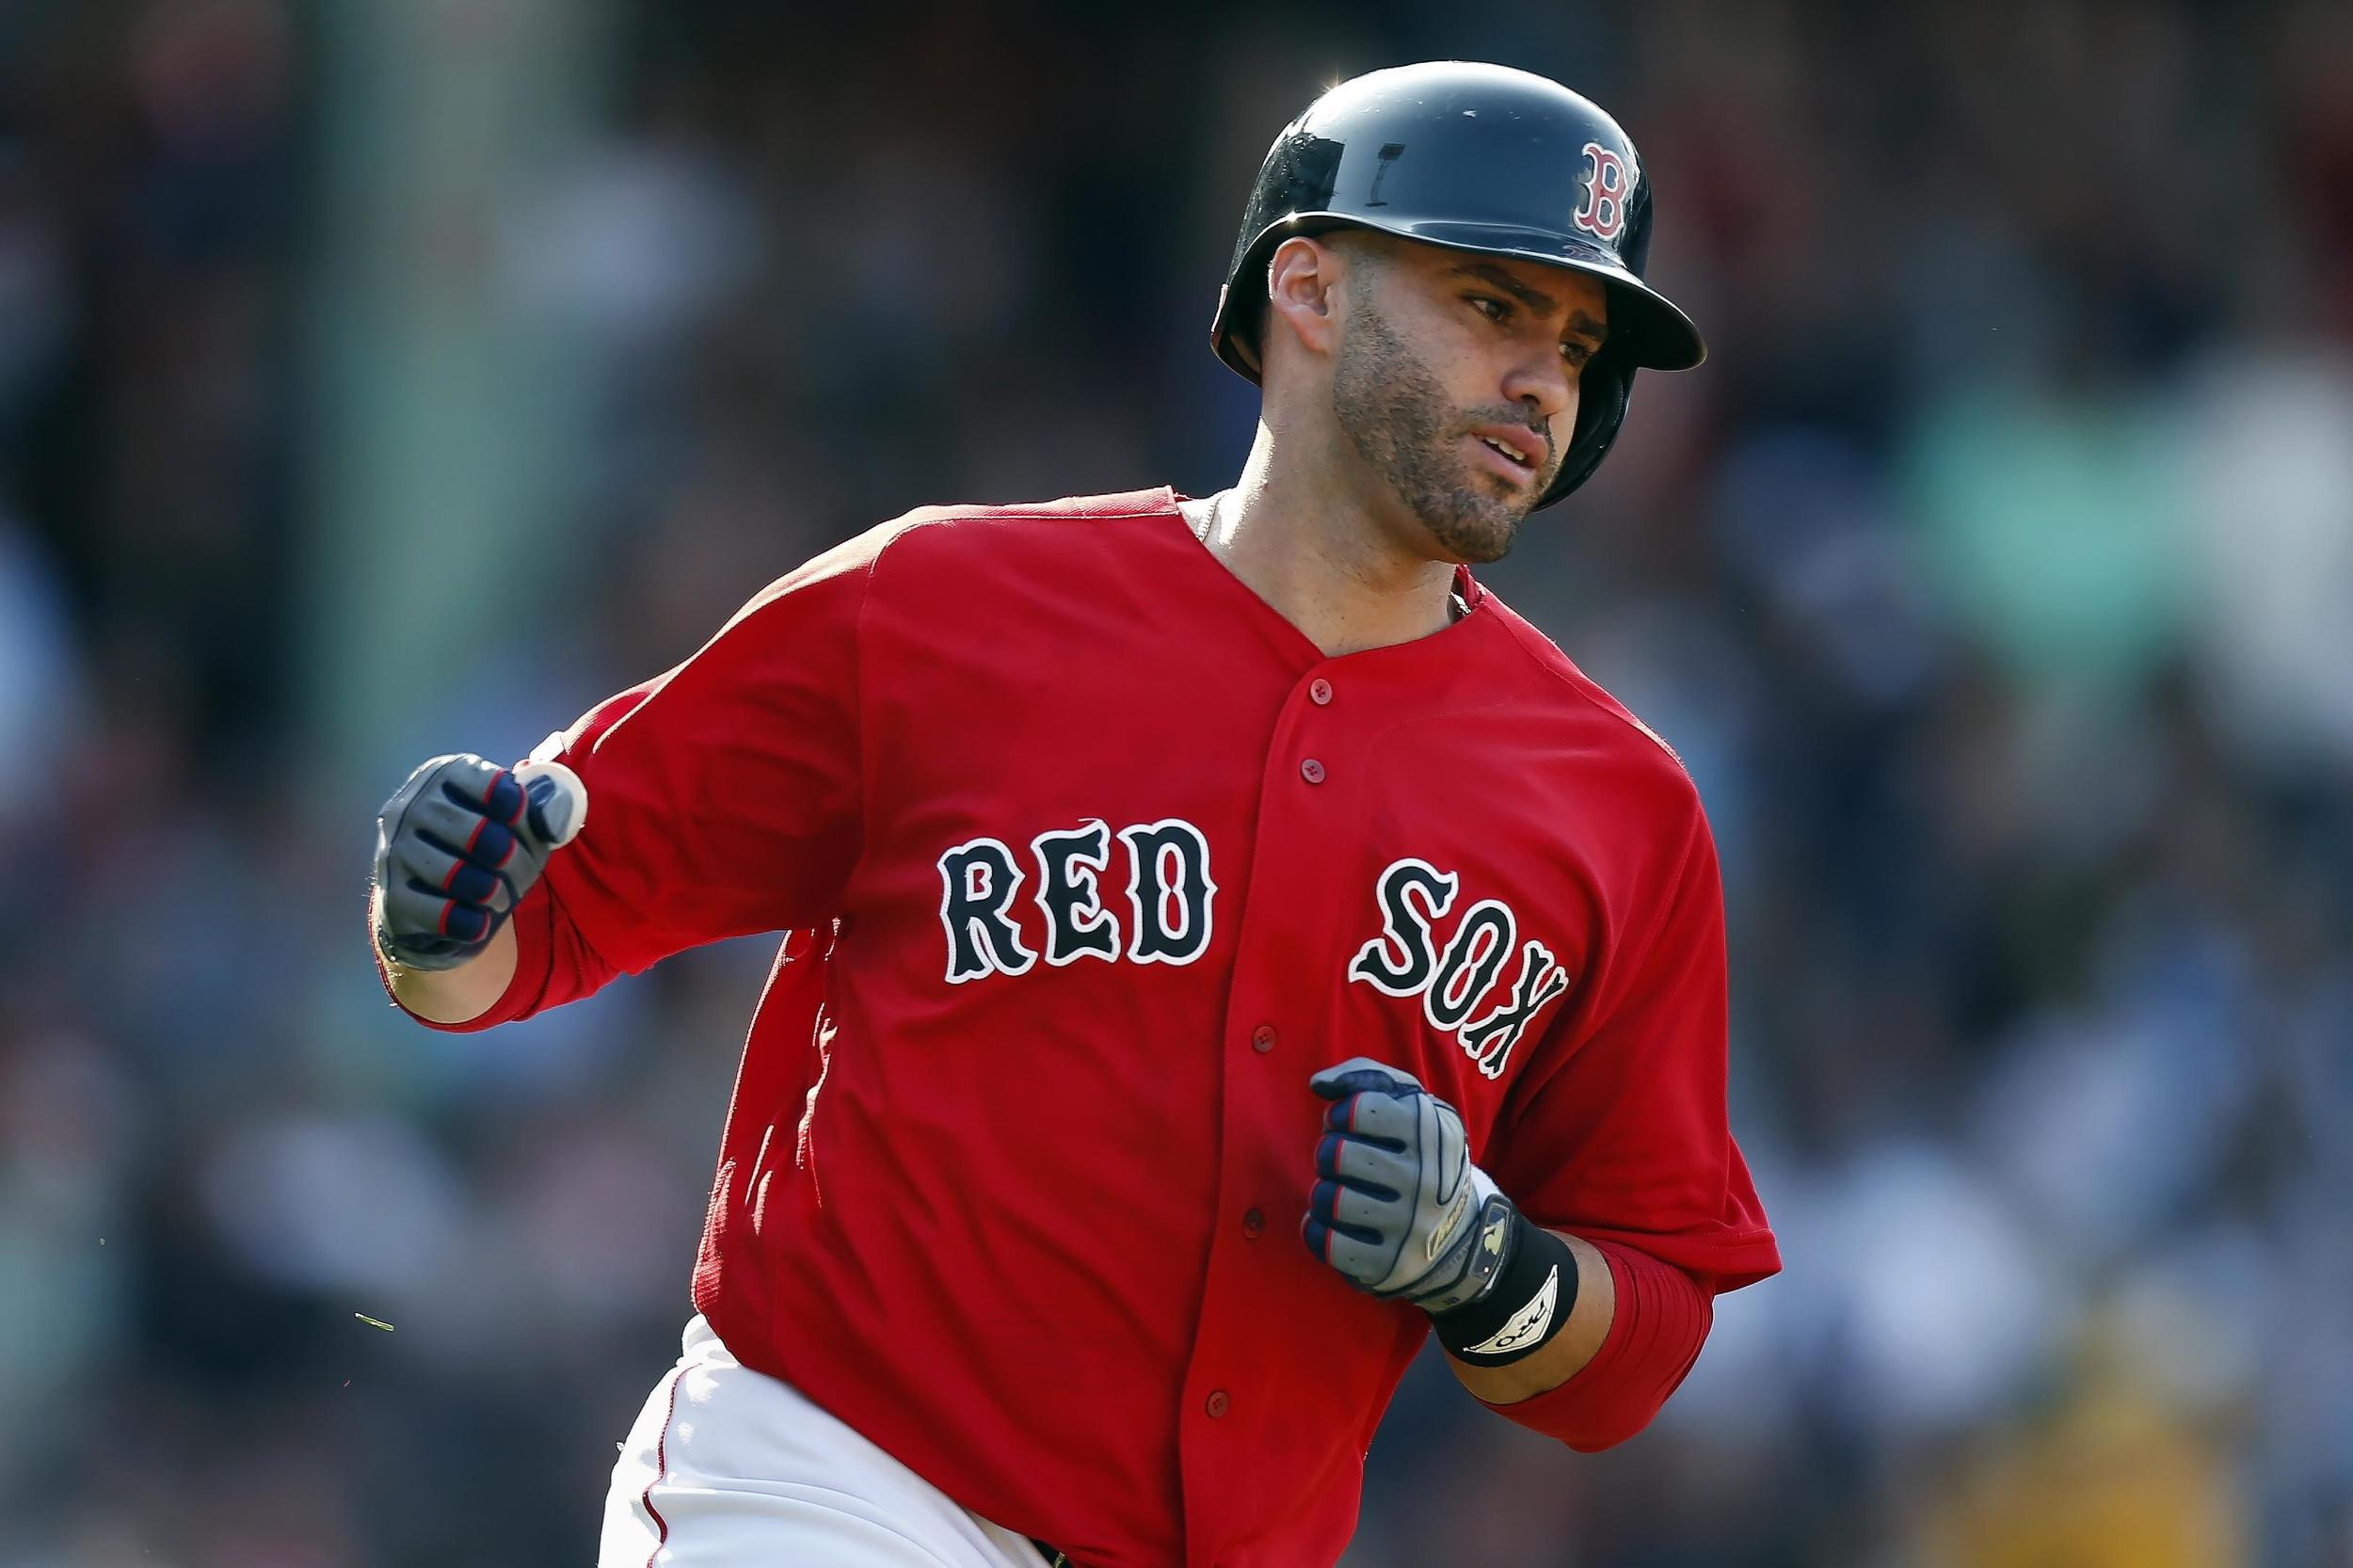 MLB roundup: J.D. Martinez, Andrew Benintendi hit homers, Red Sox pound Yankees 9-5